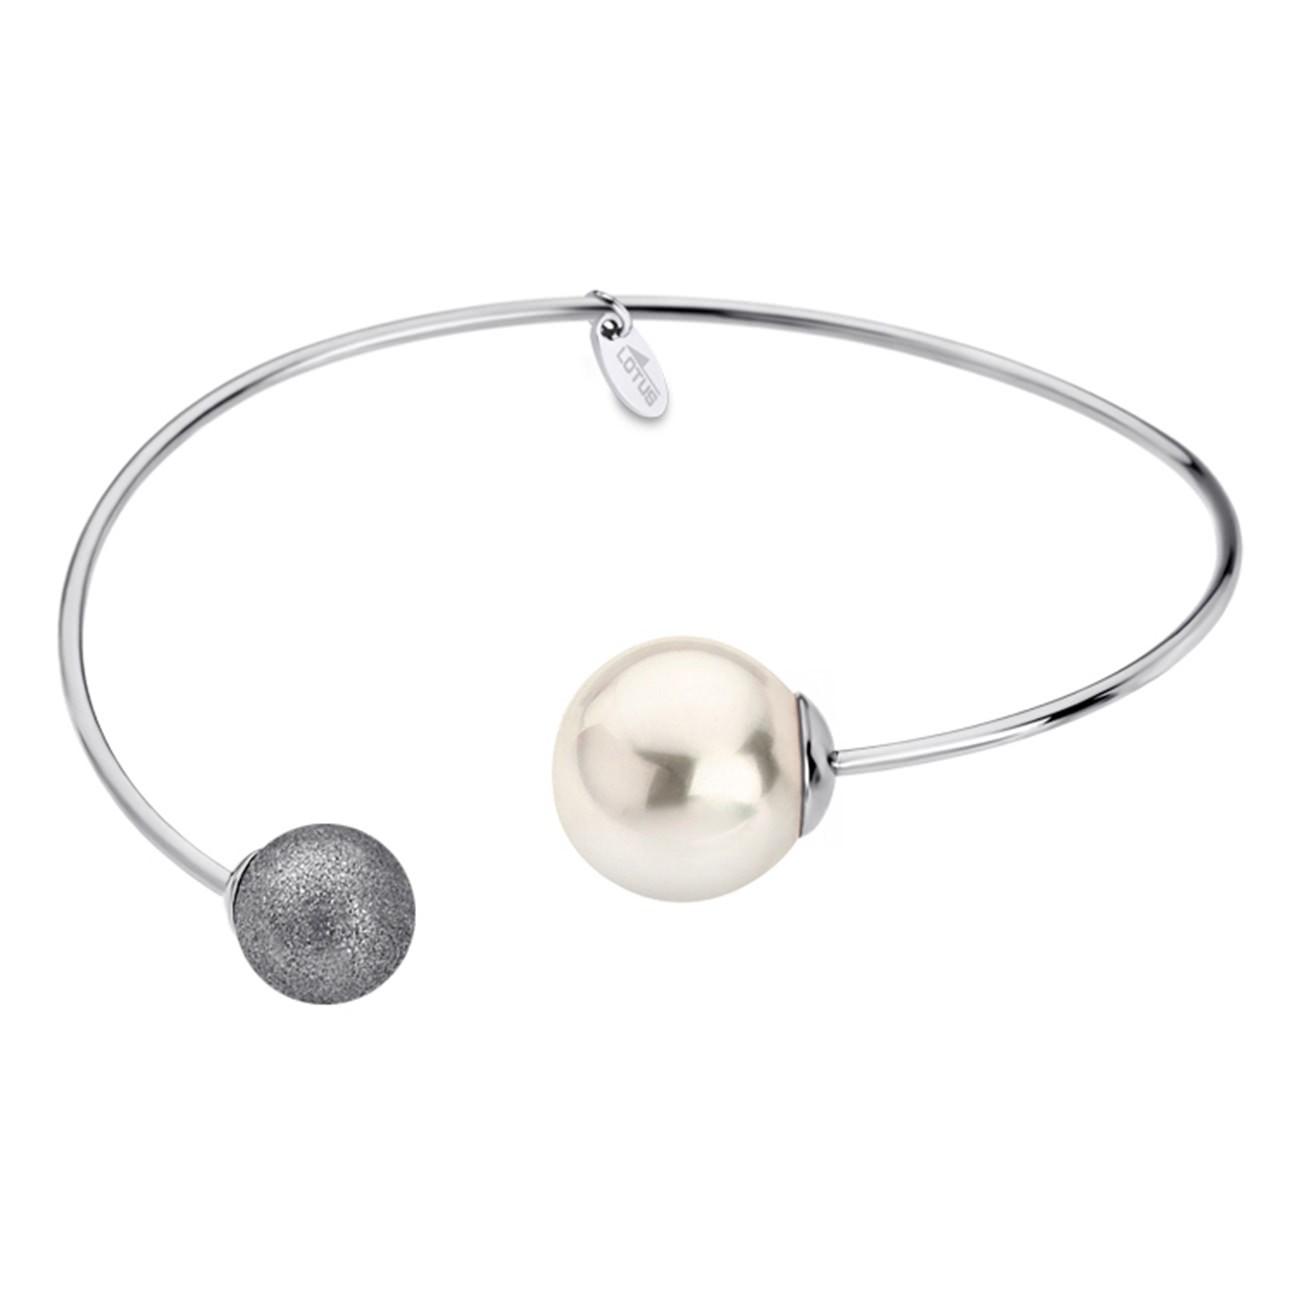 LOTUS Style Armband Damen Armreif Perle LS1823-2/1 Edelstahl JLS1823-2-1